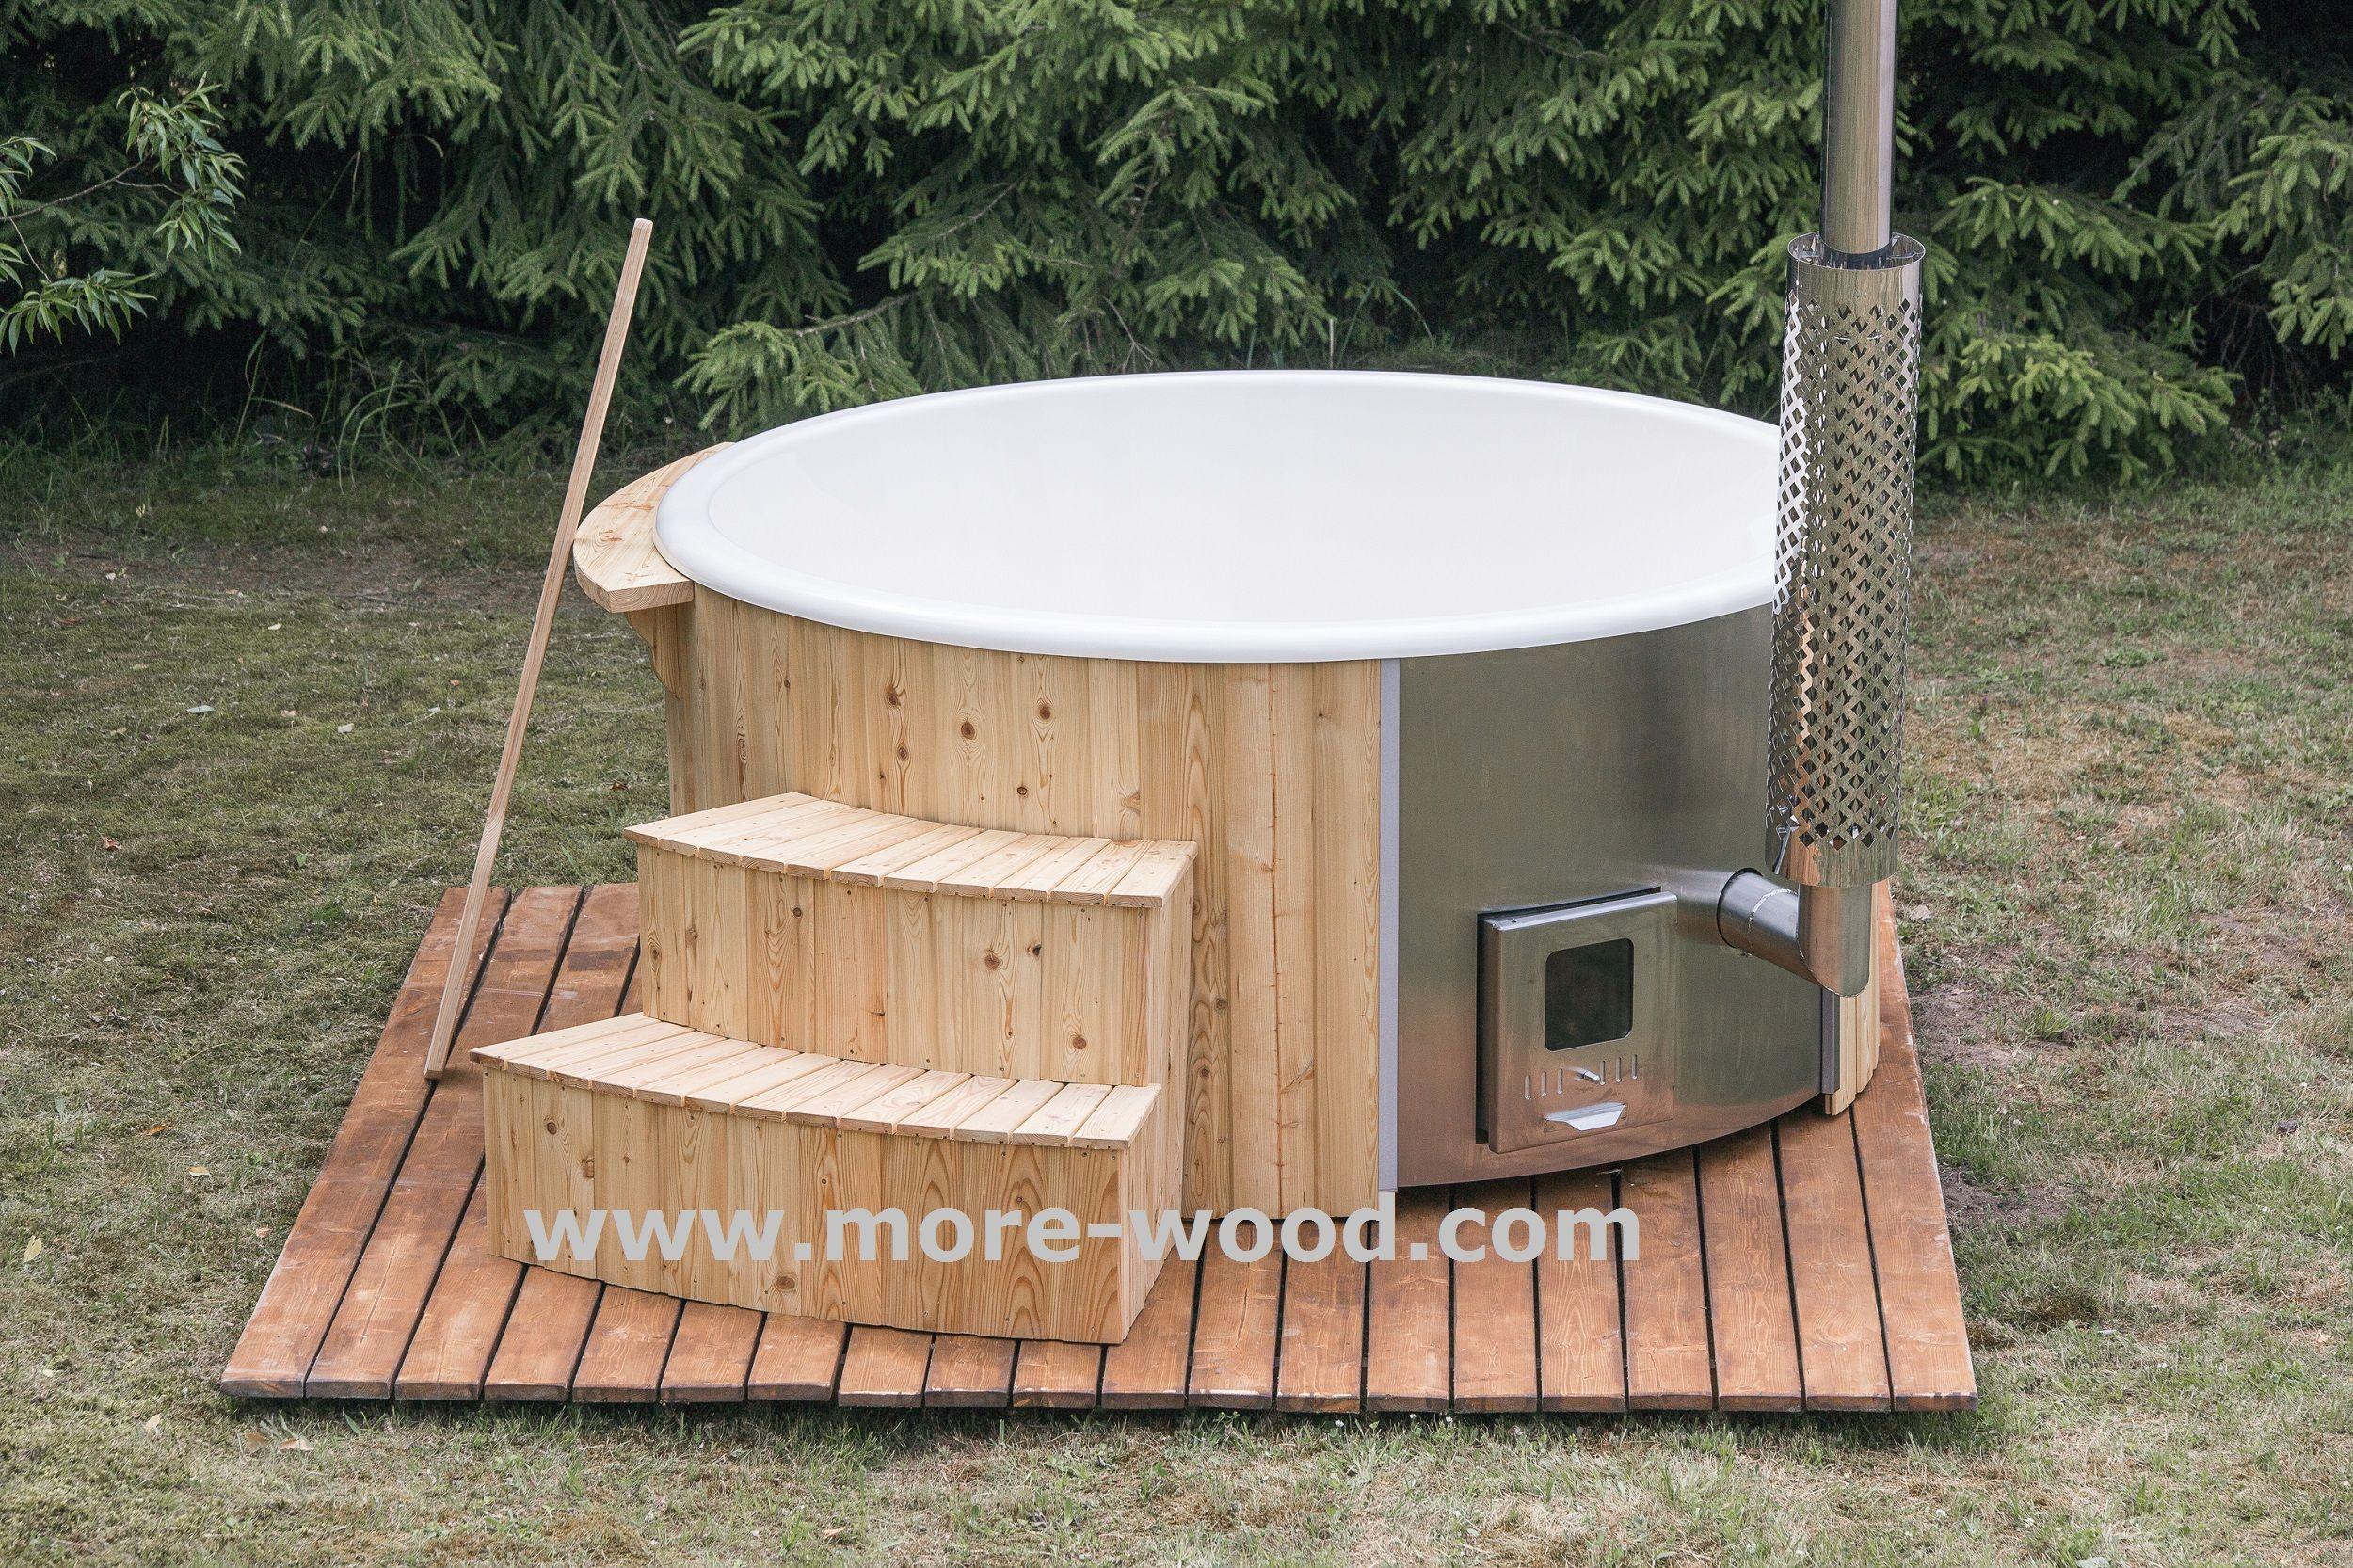 fass sauna grillkota badefass badefass. Black Bedroom Furniture Sets. Home Design Ideas